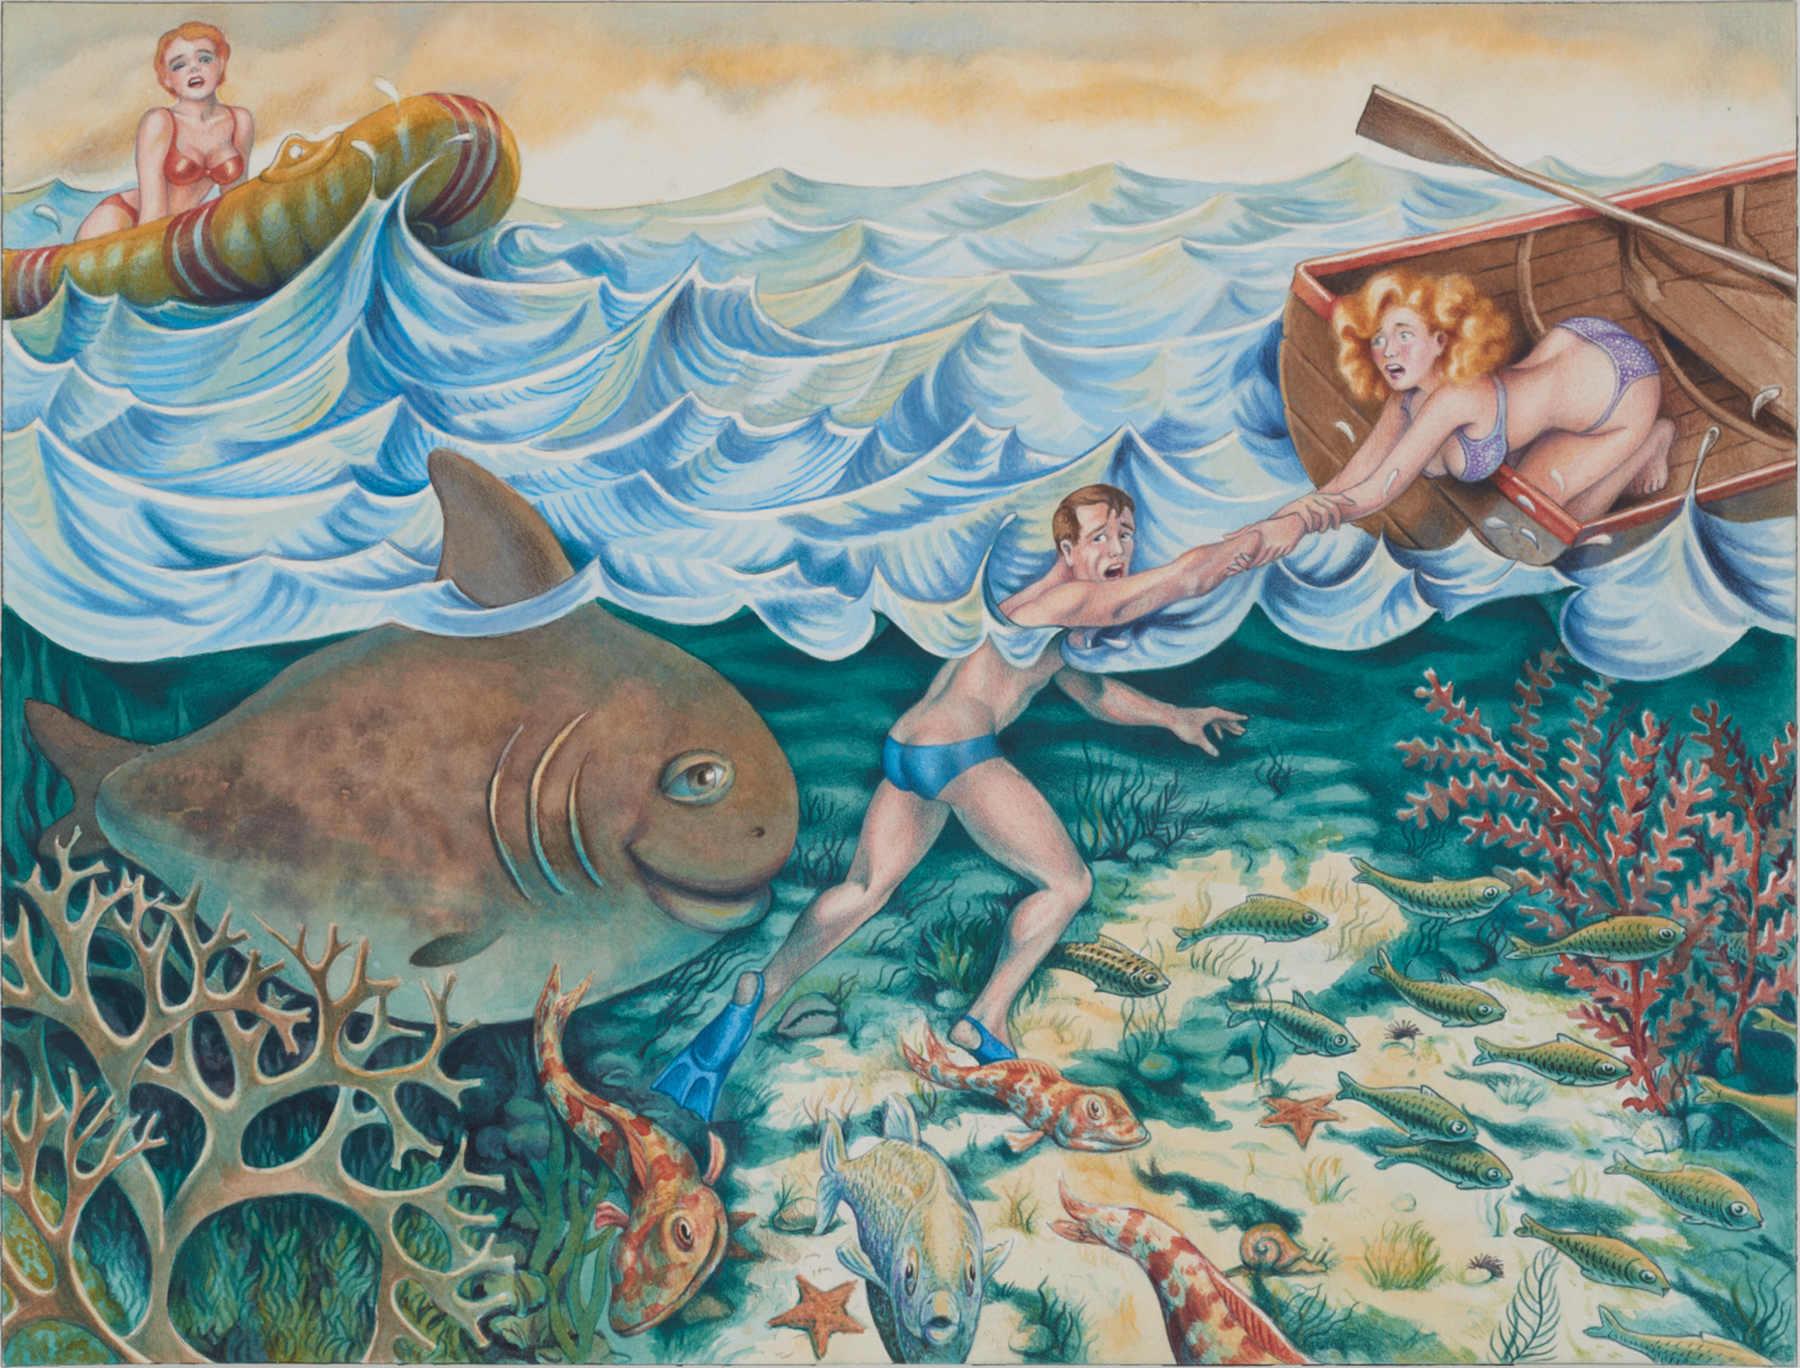 Joe Neave,Dangerous Dip, 2017,Buntstift und Aquarell auf Papier,29,7x42cm